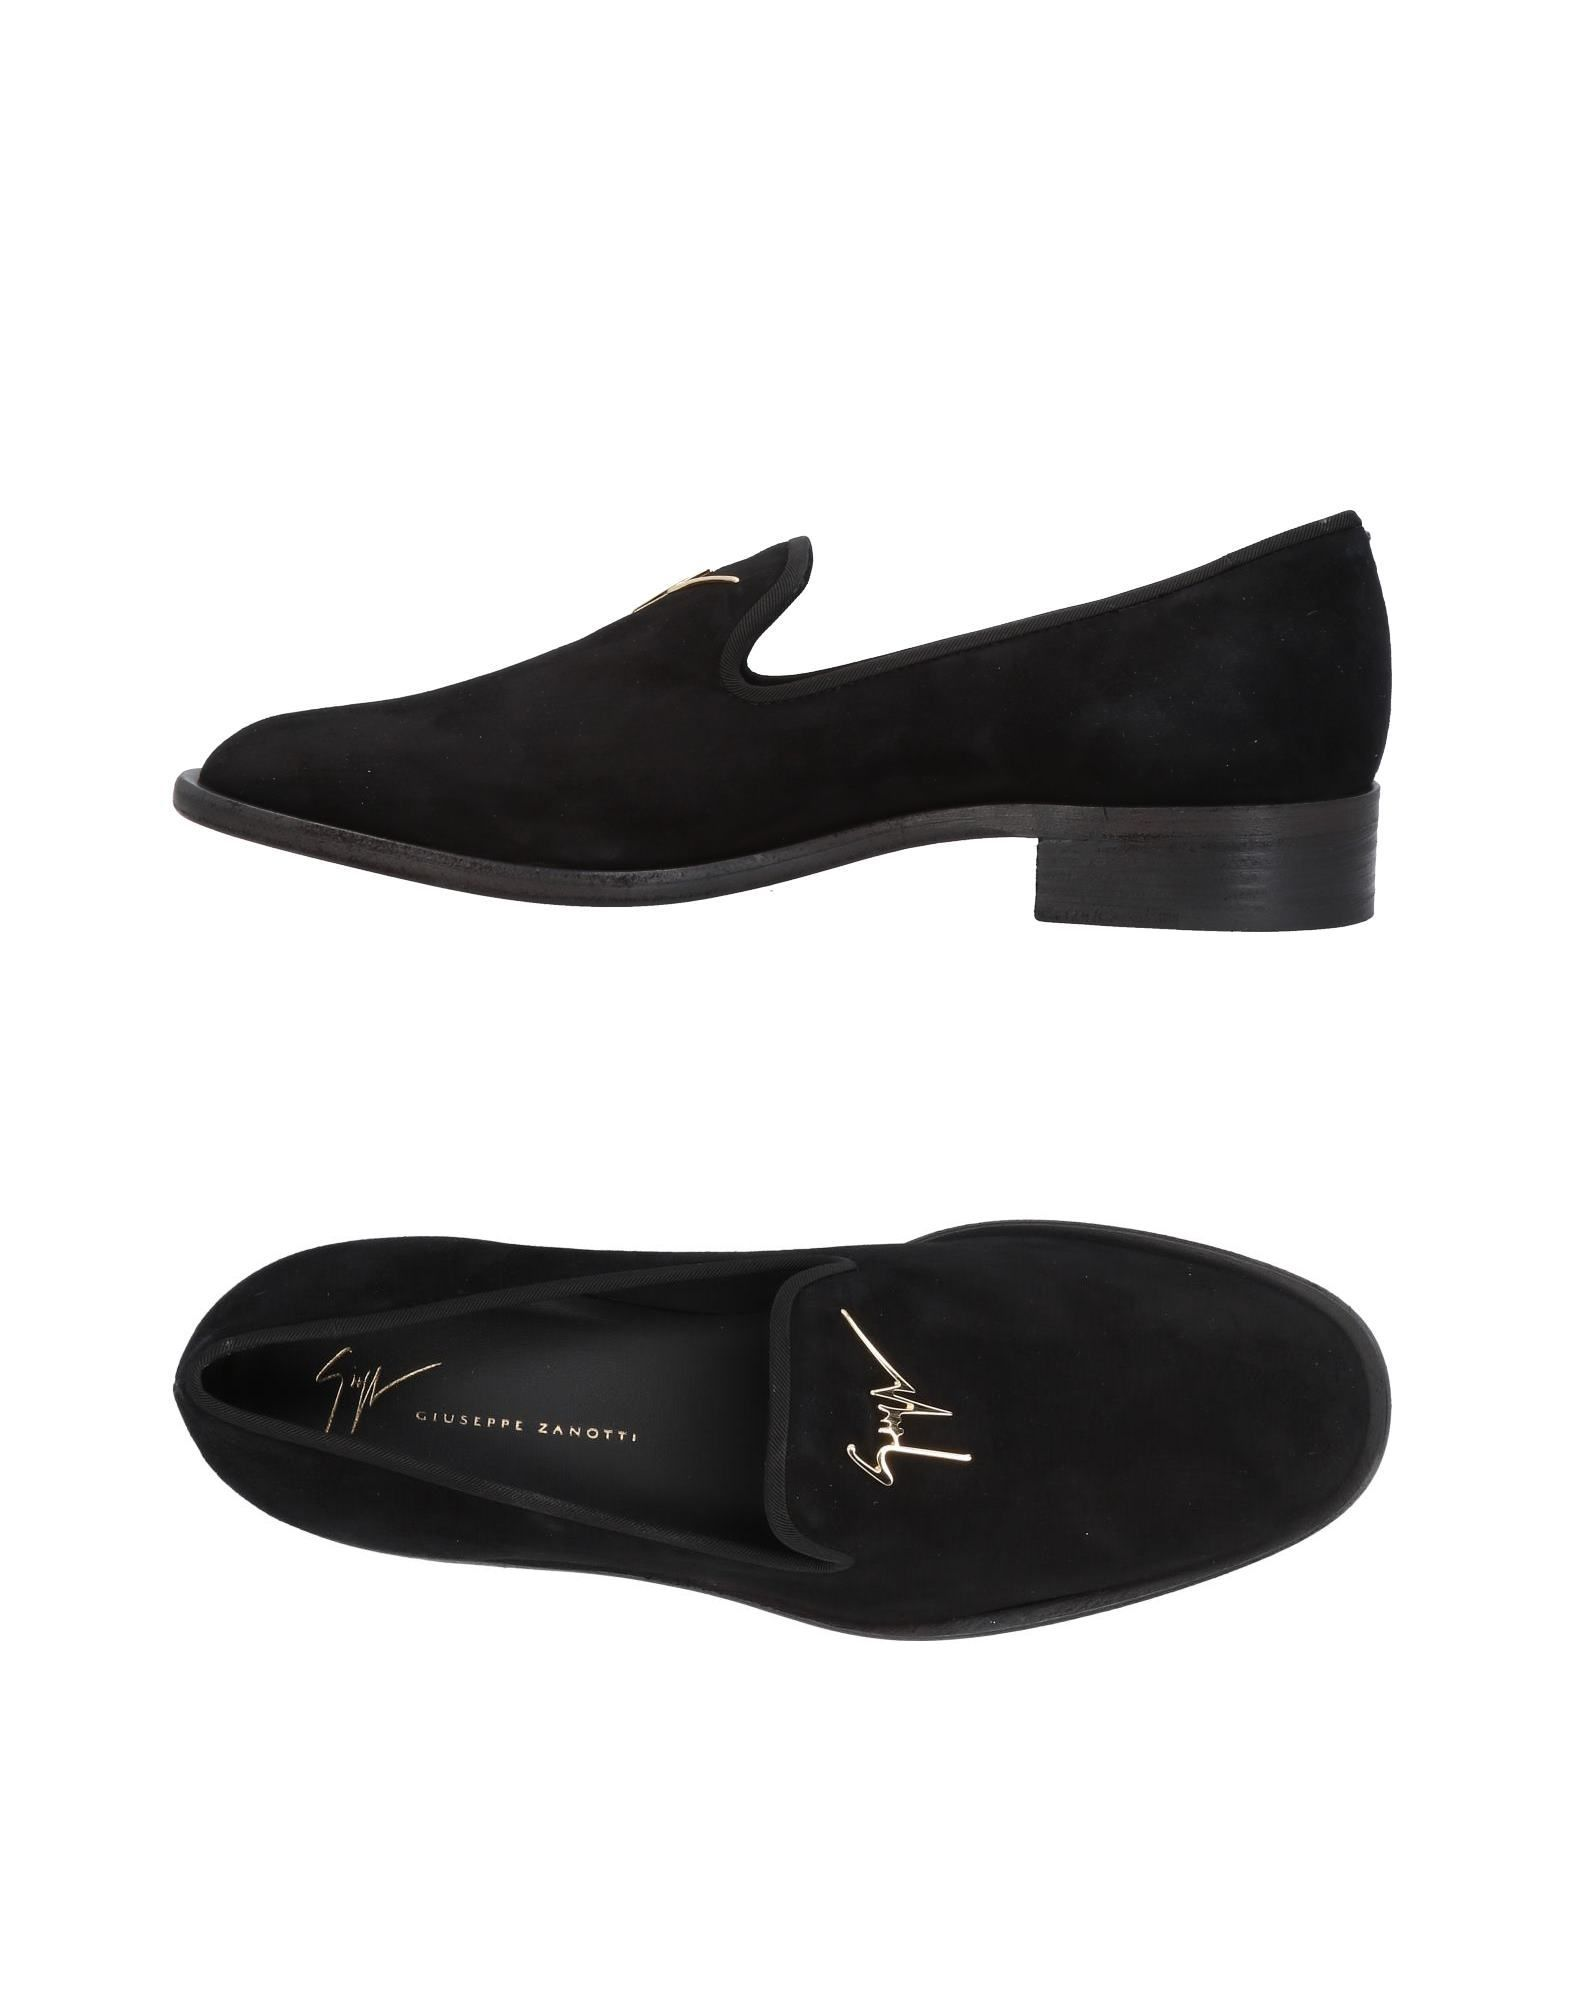 Giuseppe Zanotti Mokassins Herren  11446143FA Gute Qualität beliebte Schuhe